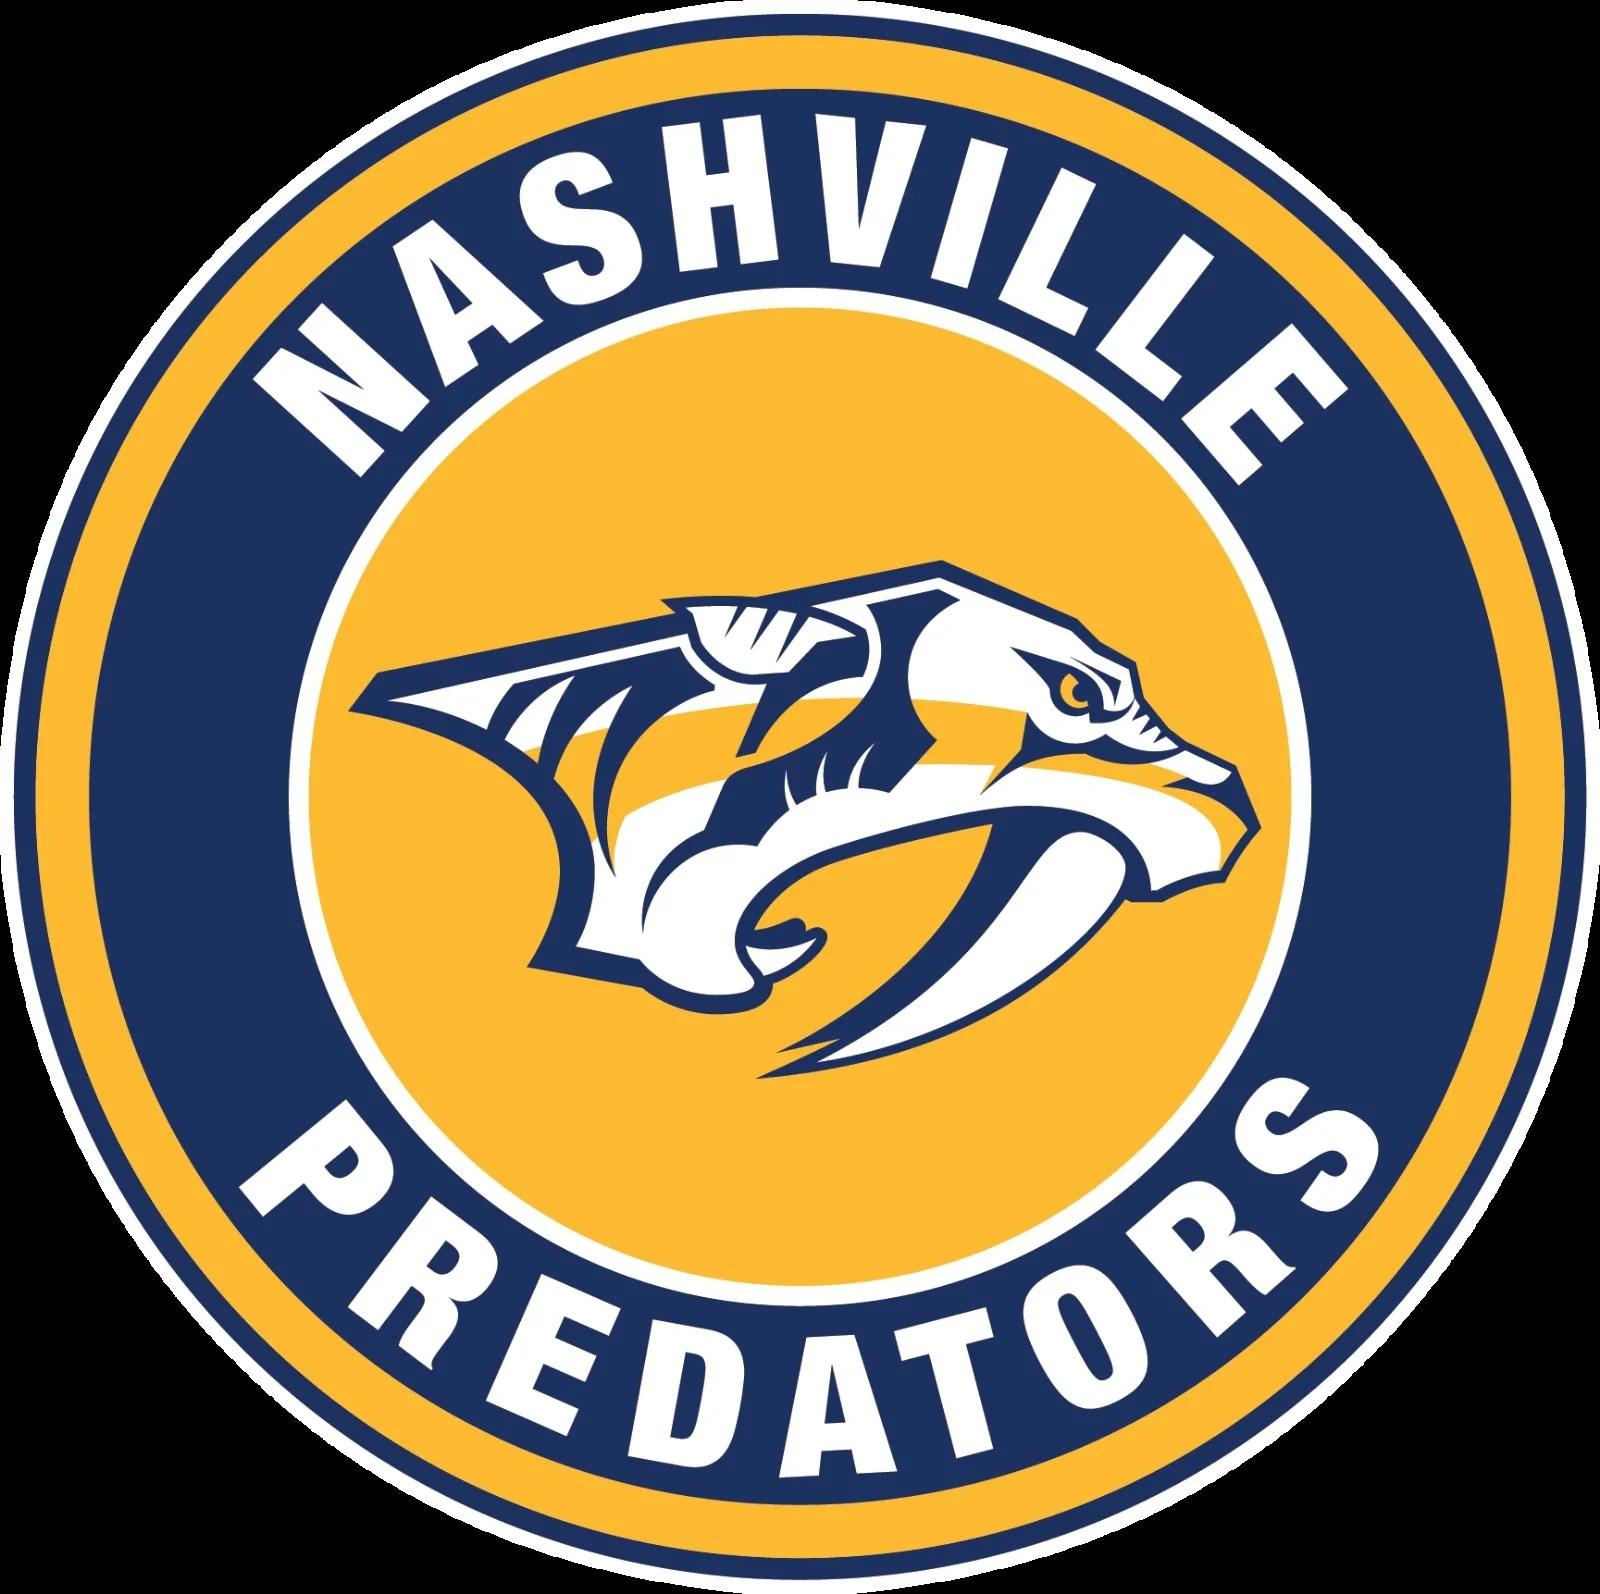 Nashville Predators Circle Logo Vinyl Decal Sticker 5 Sizes Sportz For Less